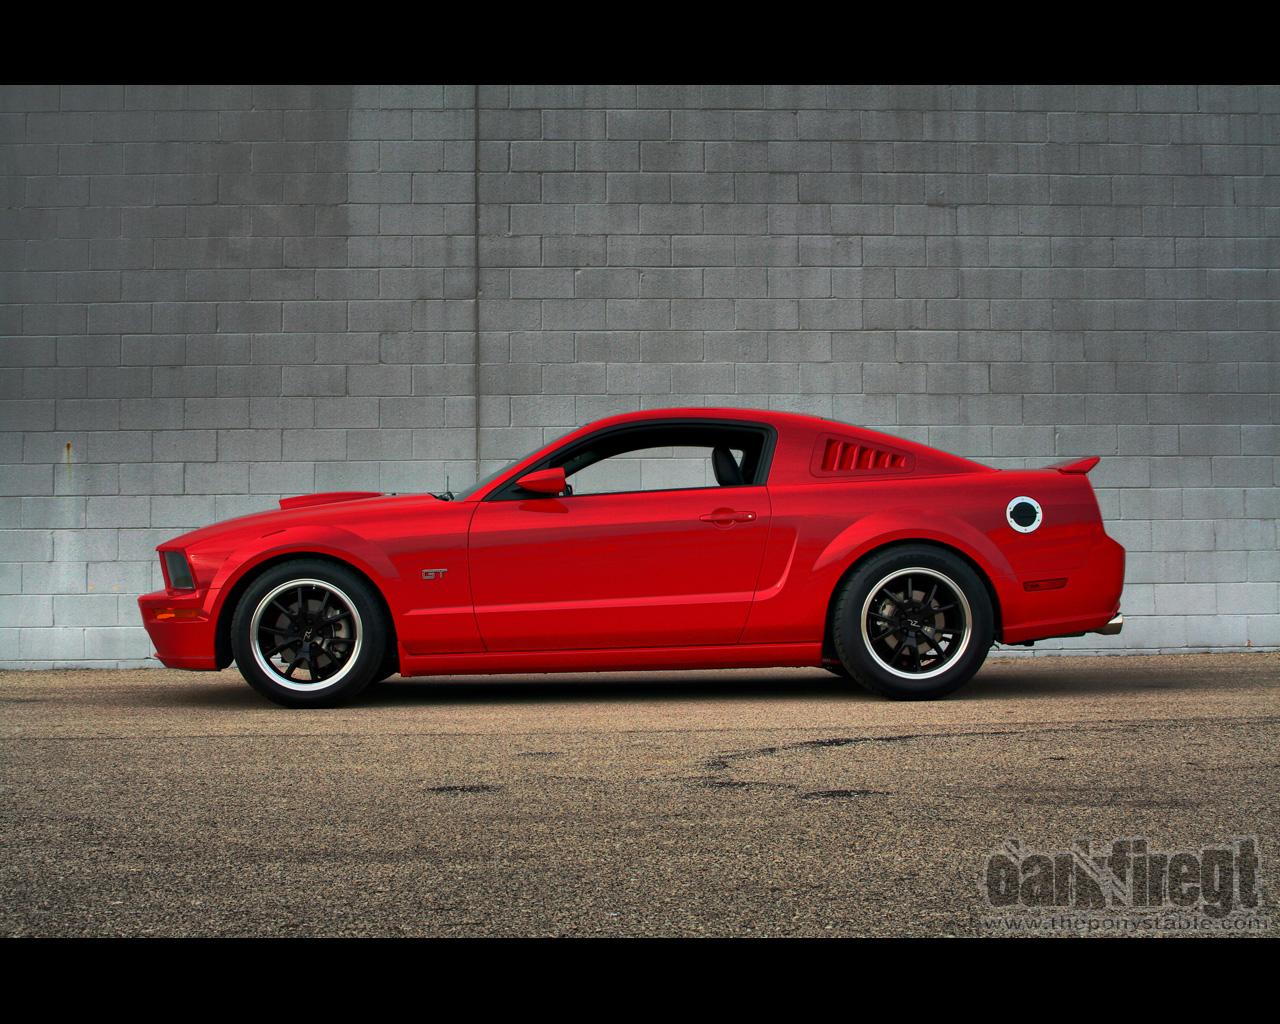 1977 Ford Mustang Cobra II 2.3